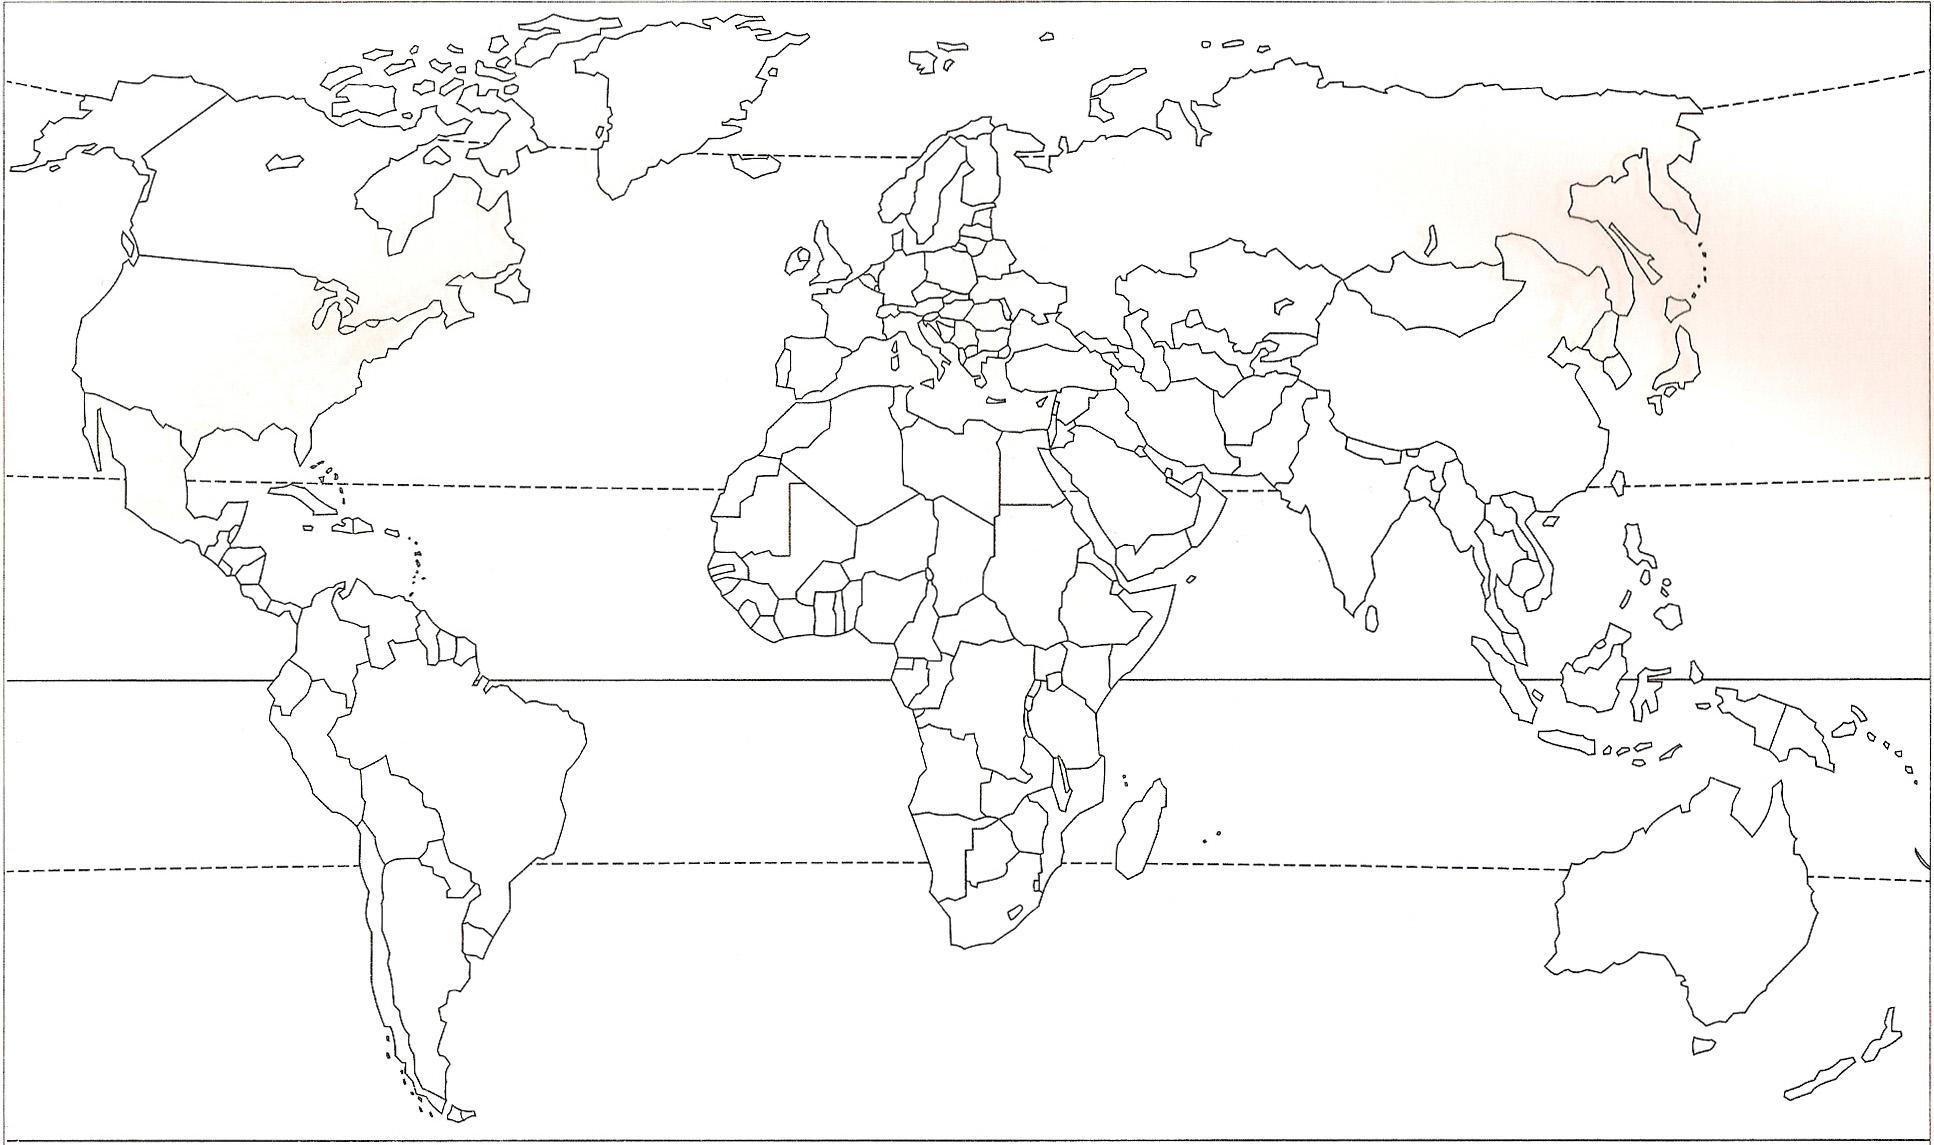 Espacoluzdiamantina: 25 Nouveau Carte Du Monde Politique Vierge avec Carte Vierge À Imprimer